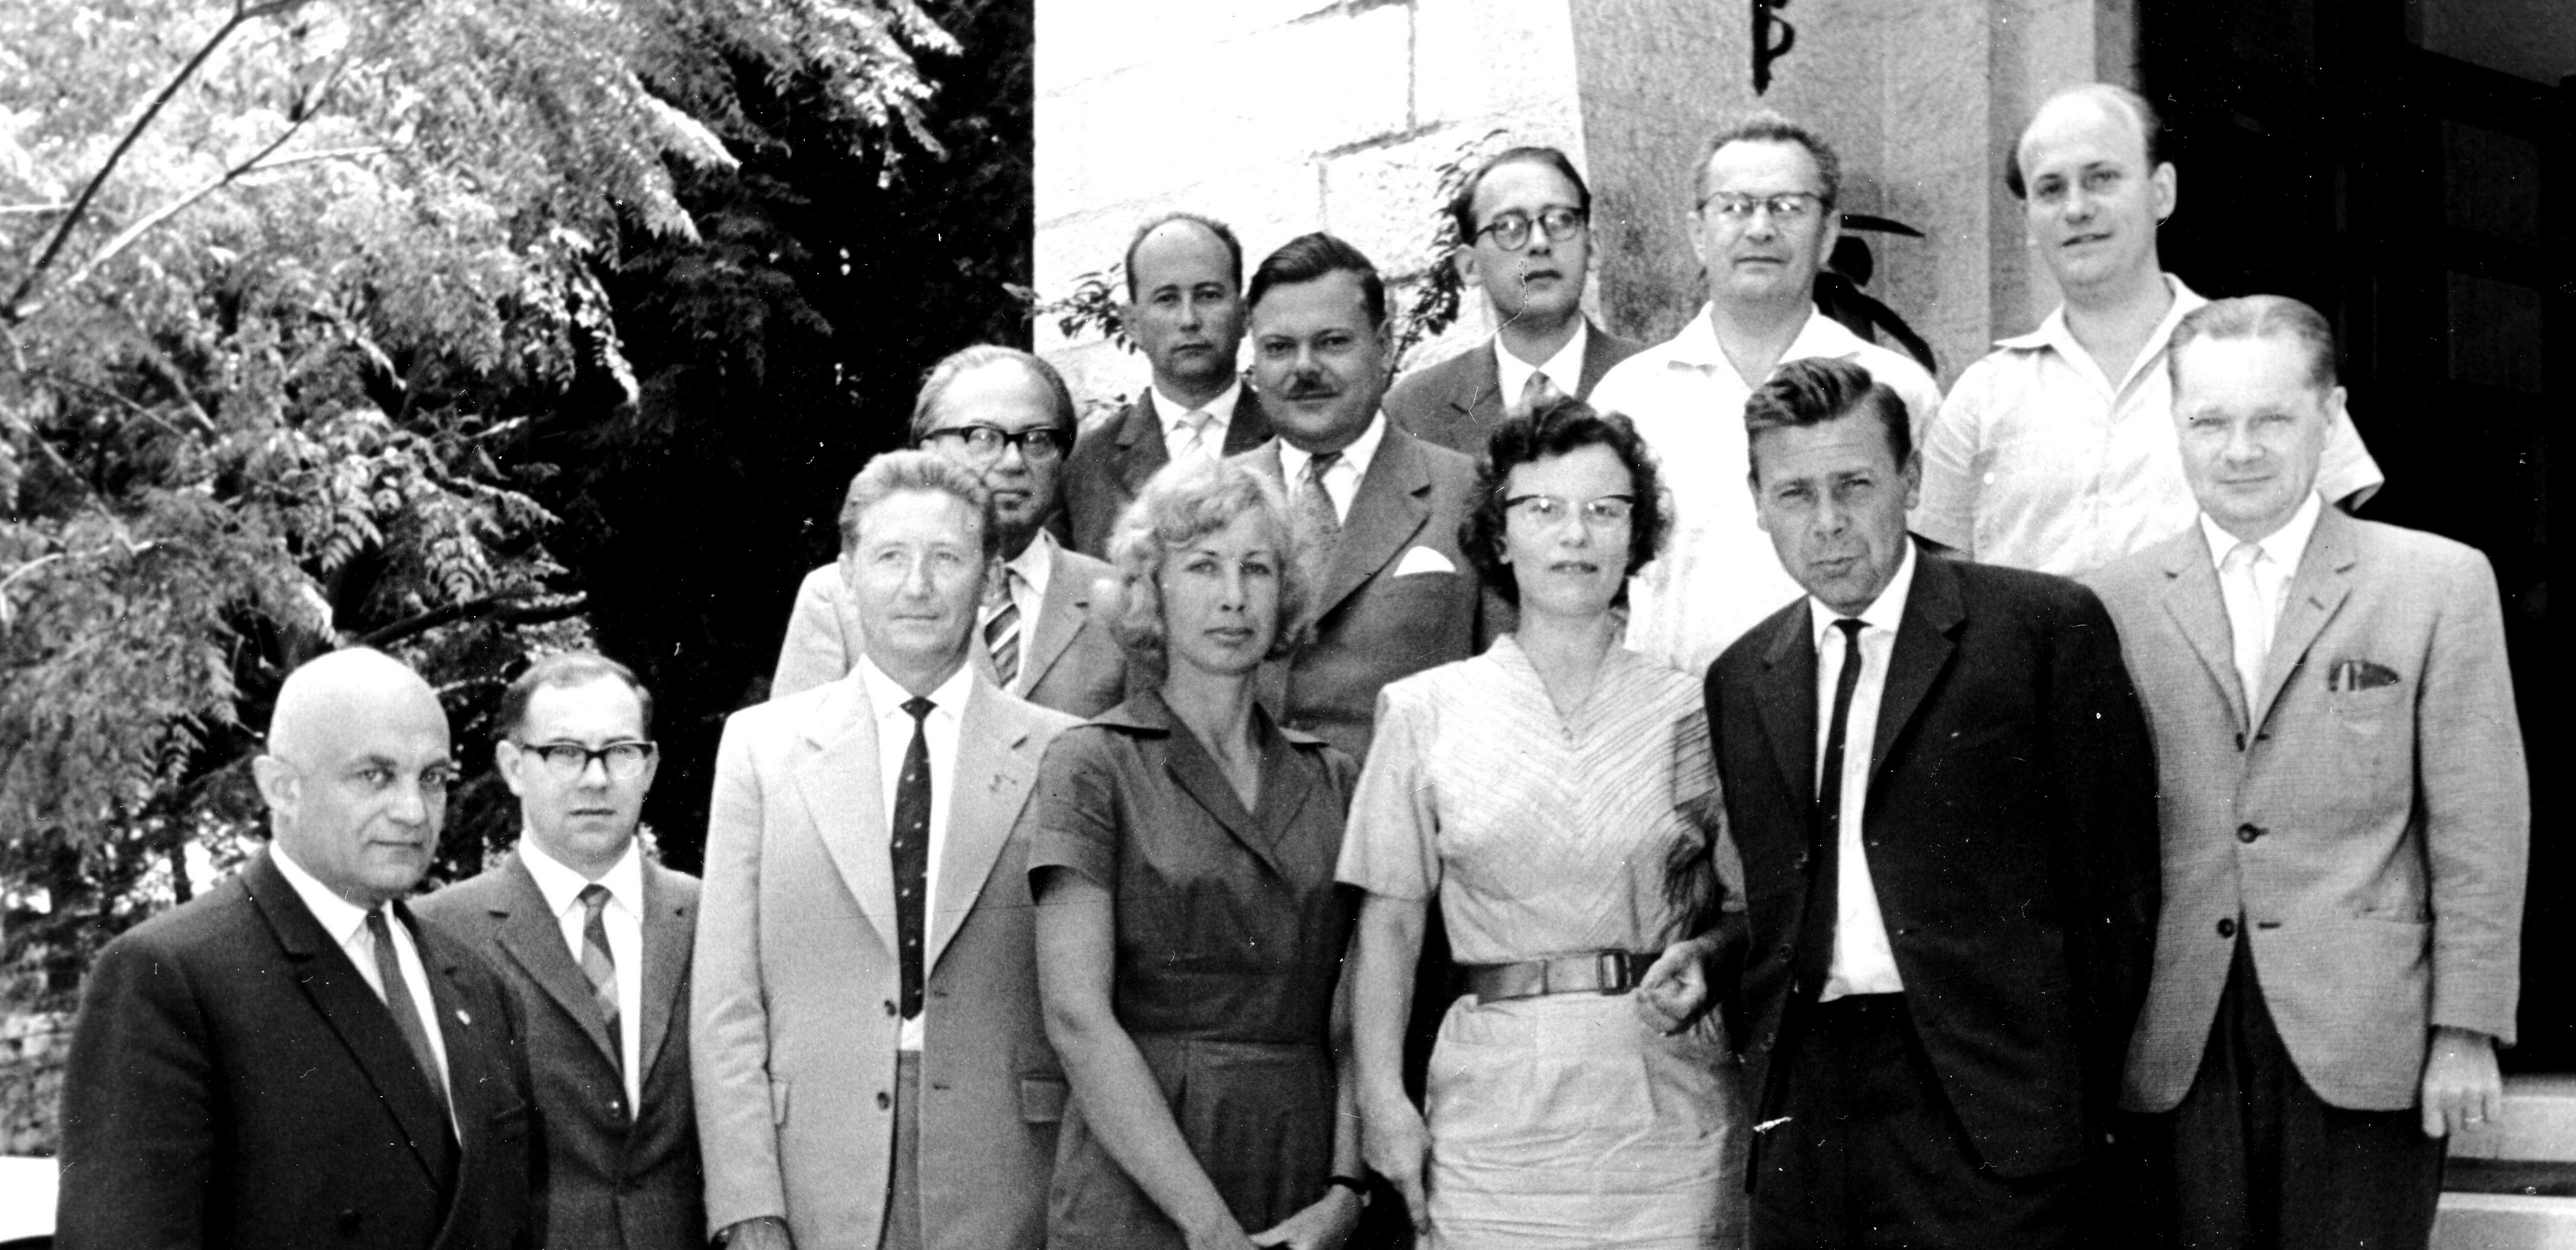 1963-iccf-congress-dubrovnik-yugoslavia